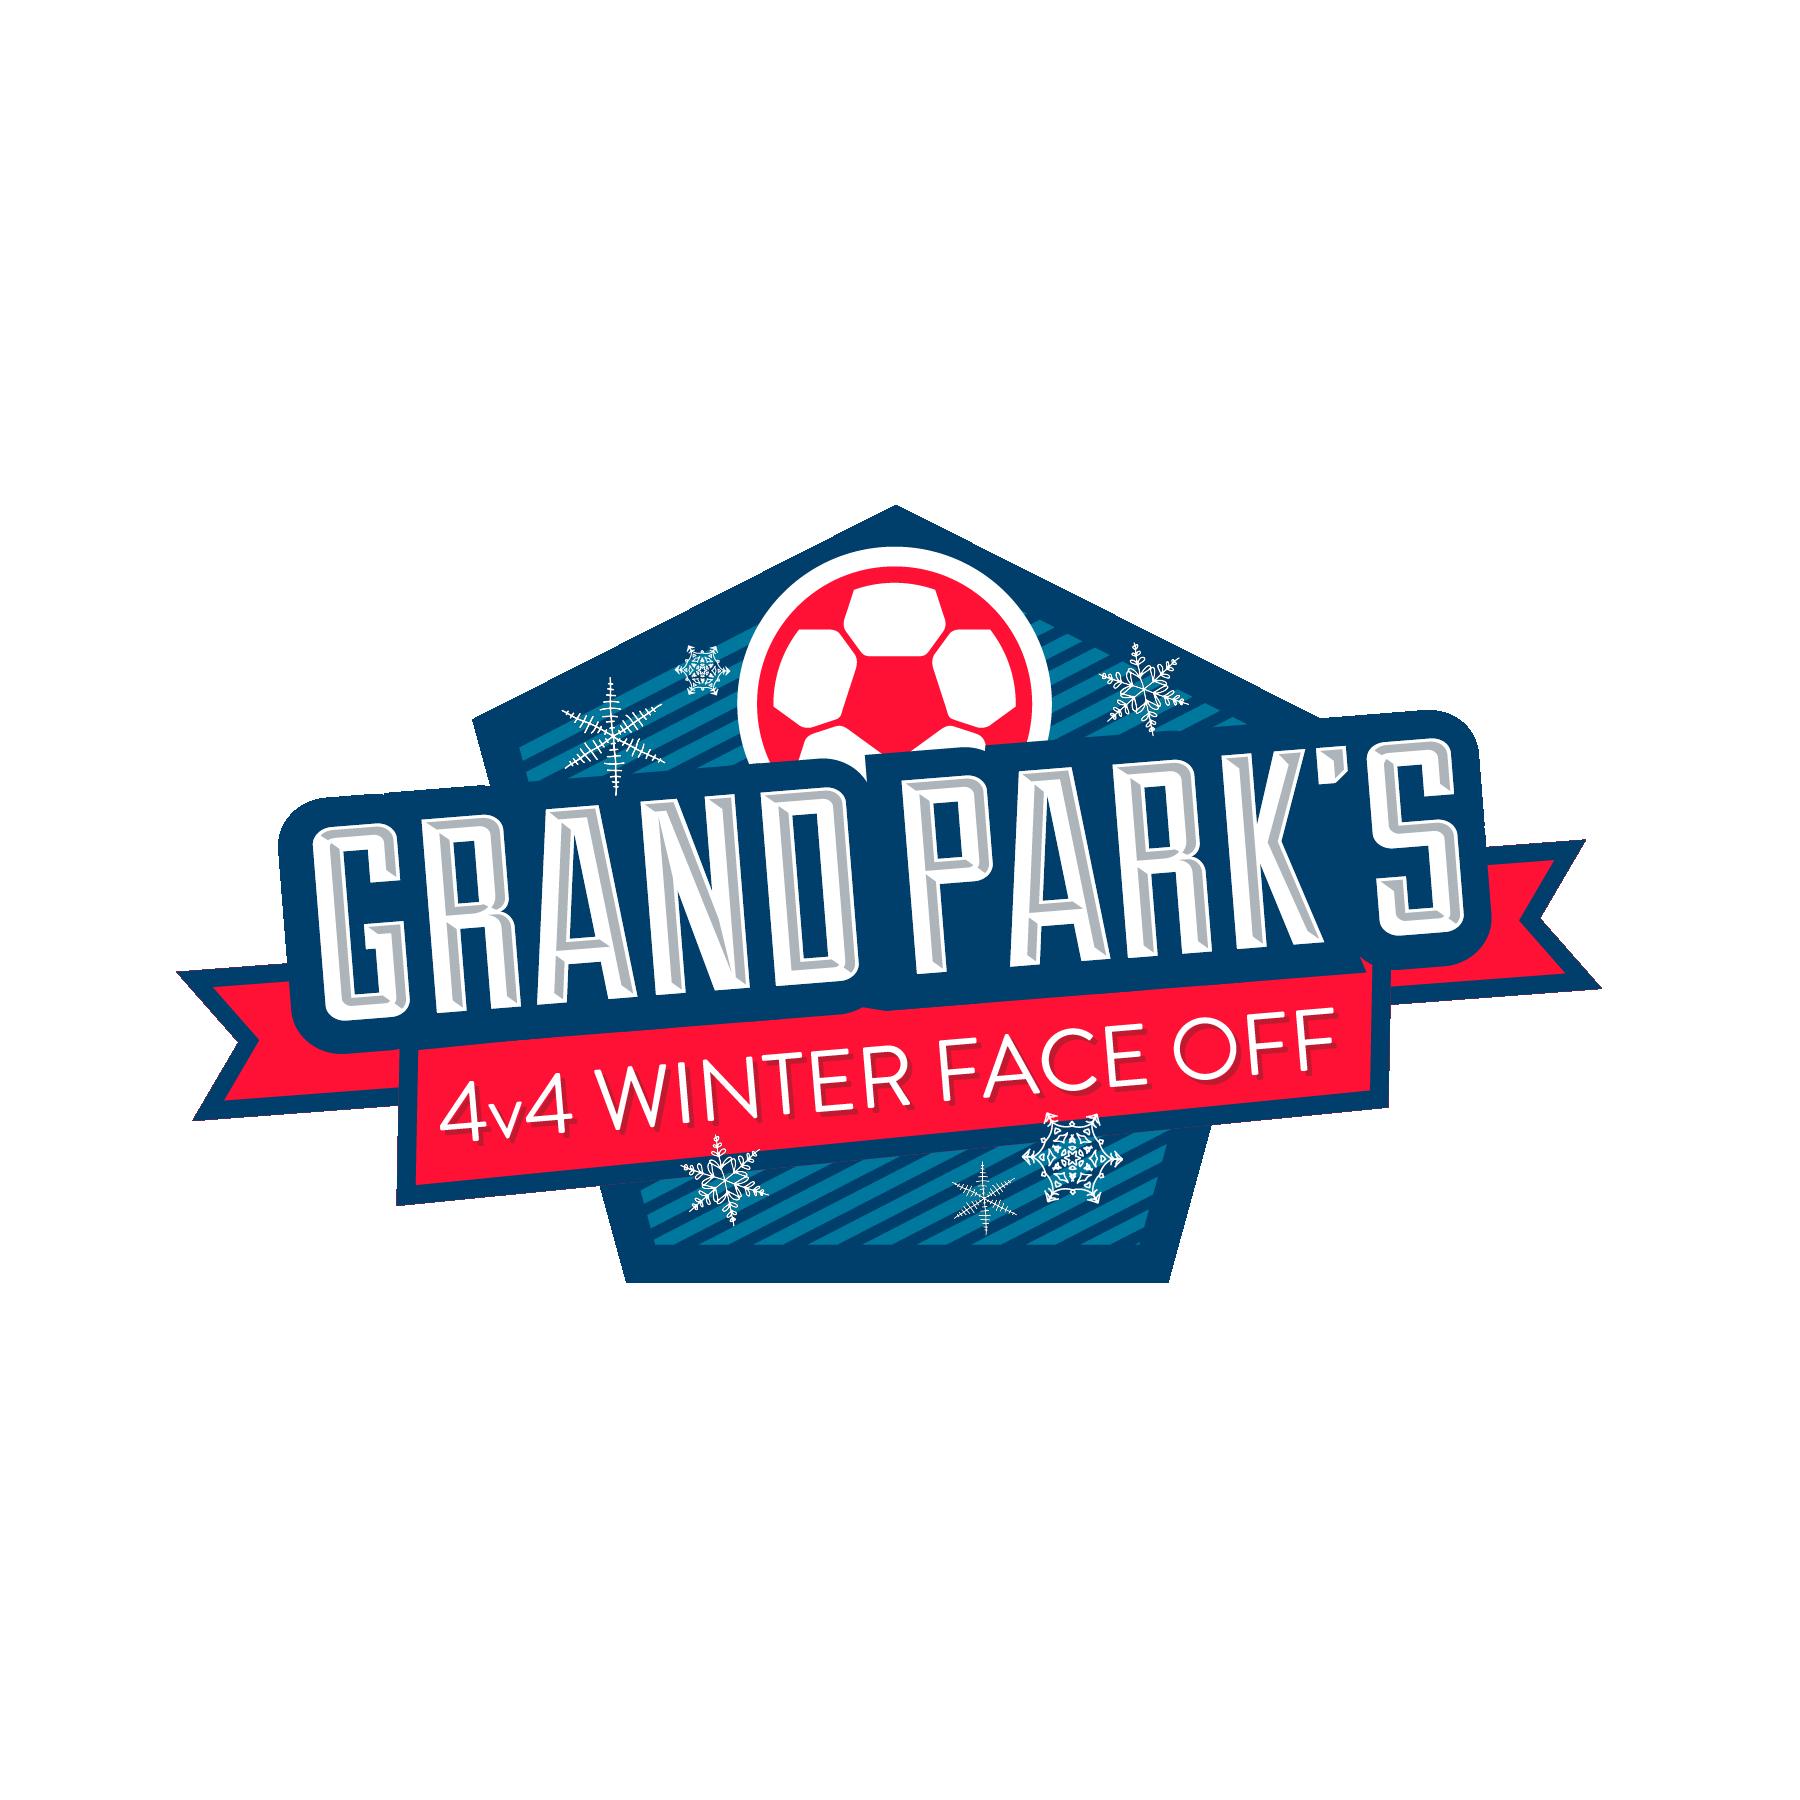 GrantPark-4v4-logo-01.png